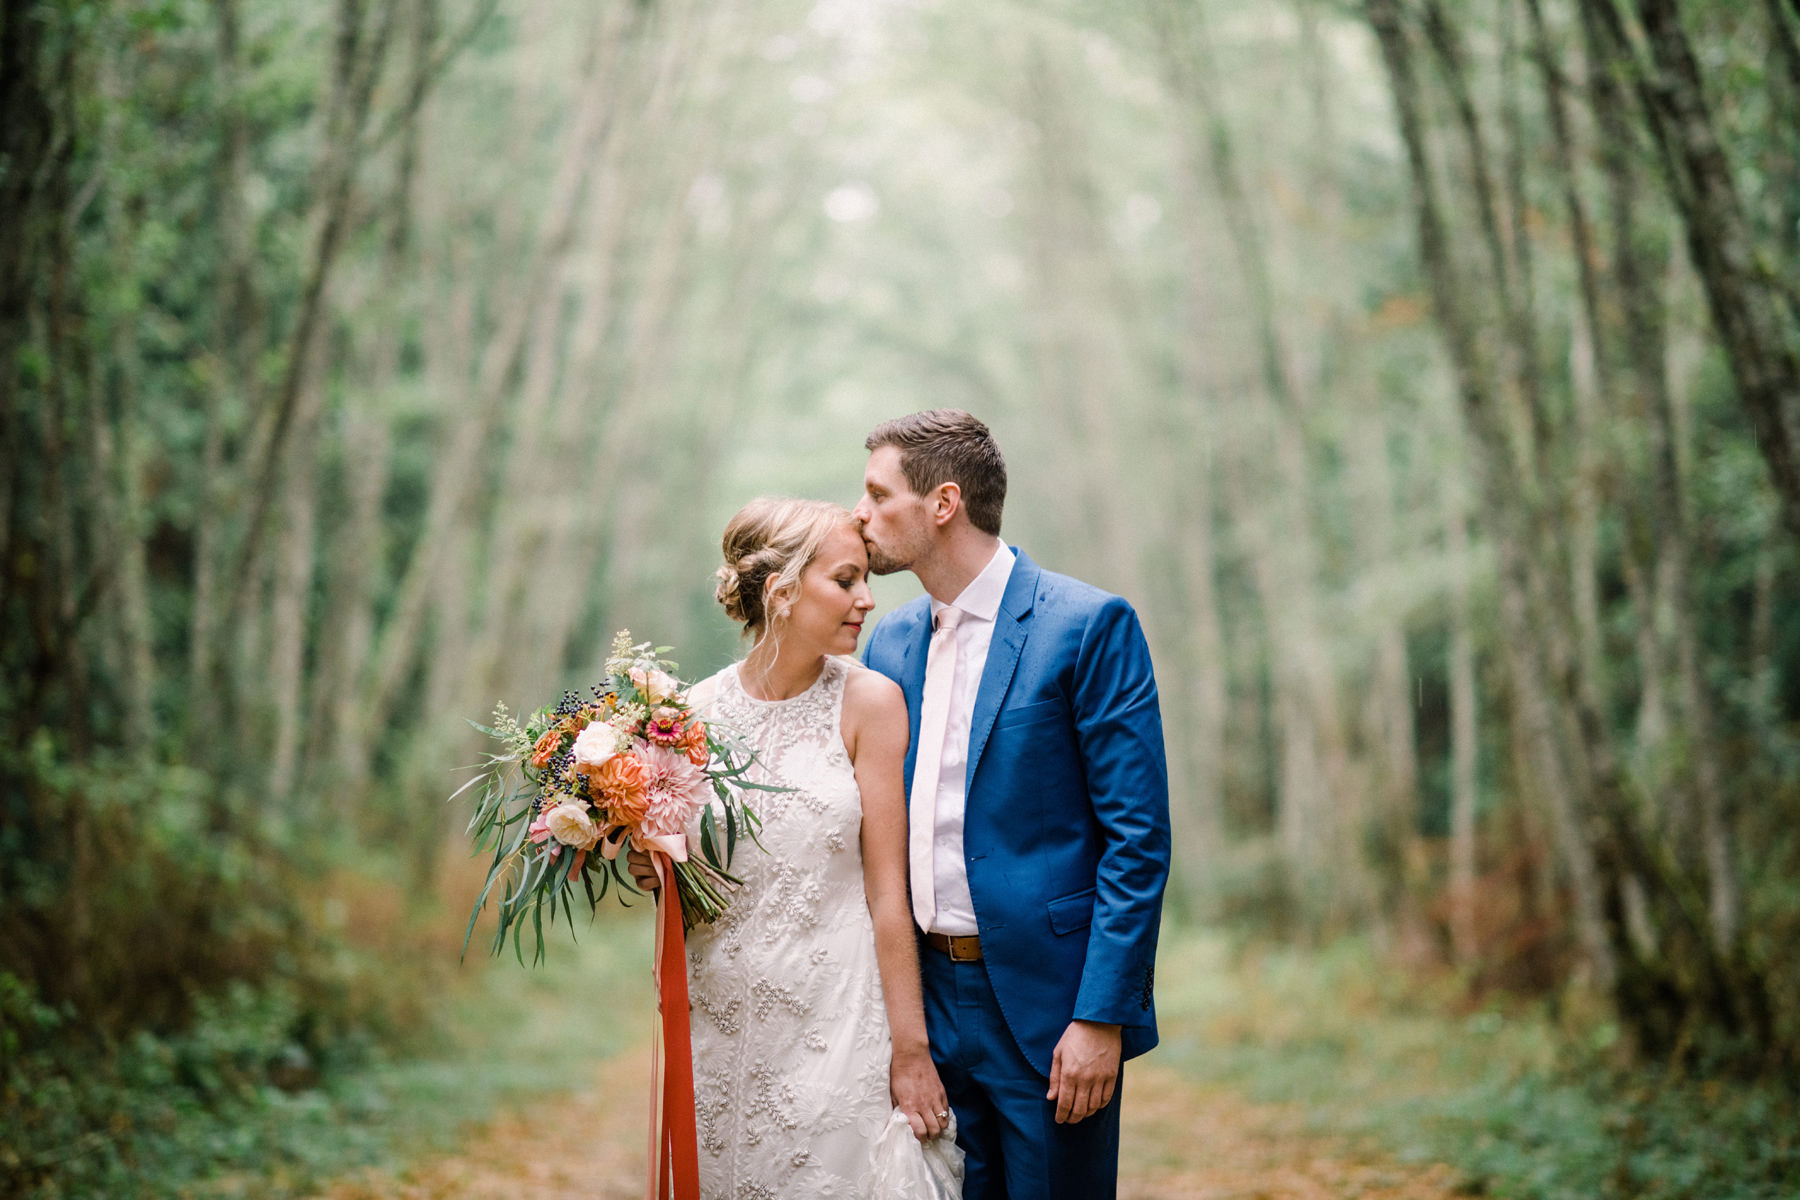 295-colorful-outdoor-lopez-island-wedding.jpg